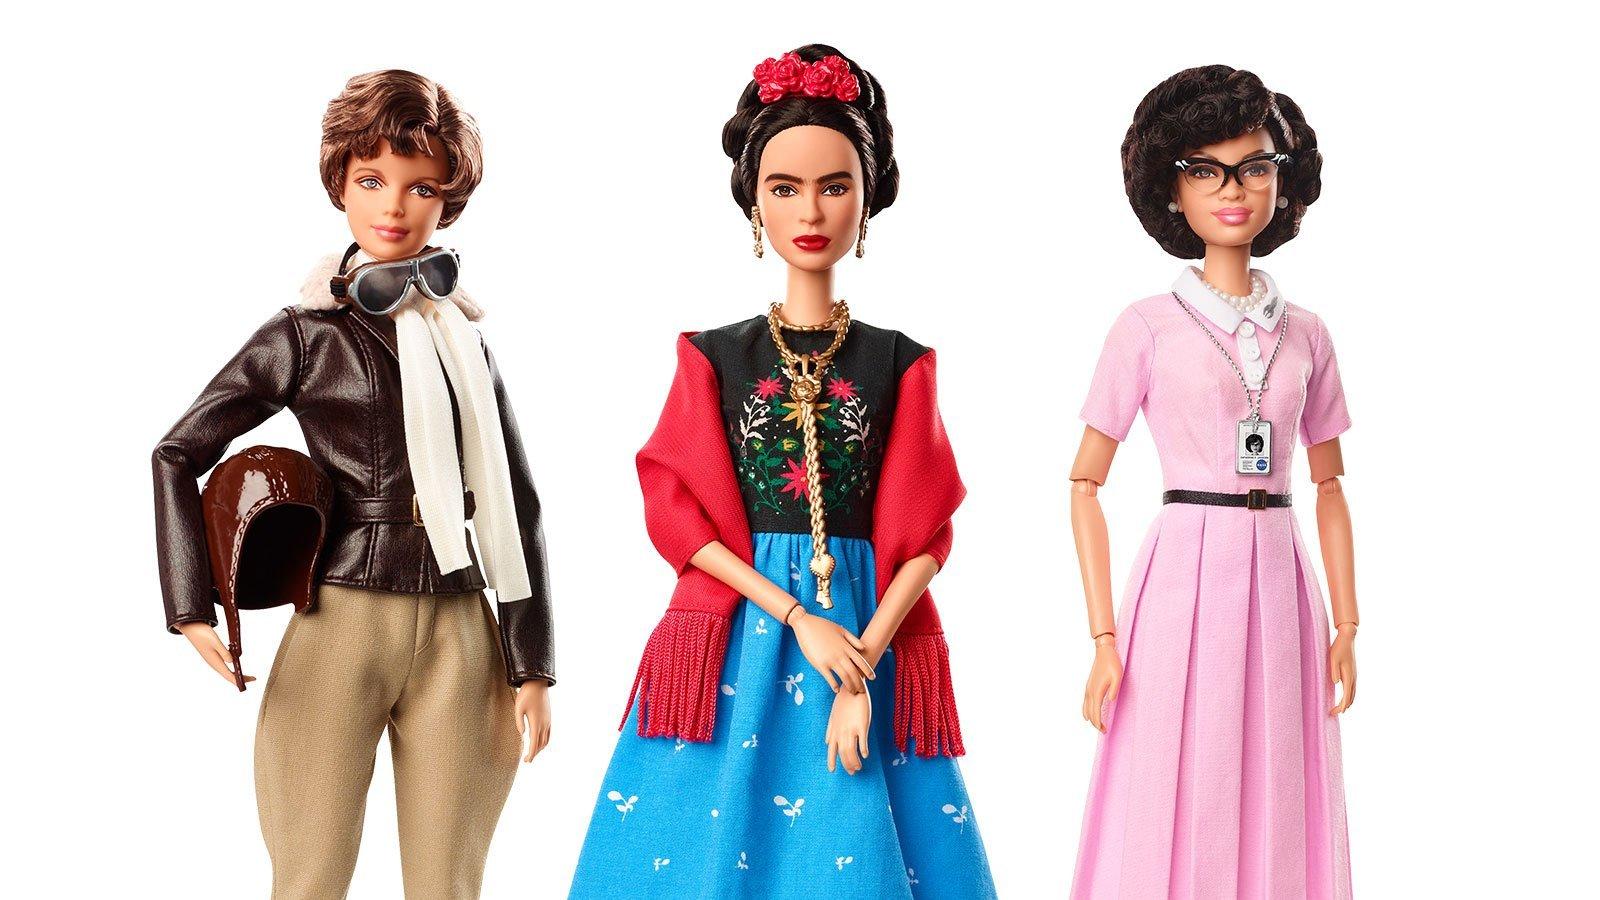 Among the new Barbie dolls are likenesses of Amelia Earhart, Frida Kahlo and Katherine Johnson. (Credit: Mattel)